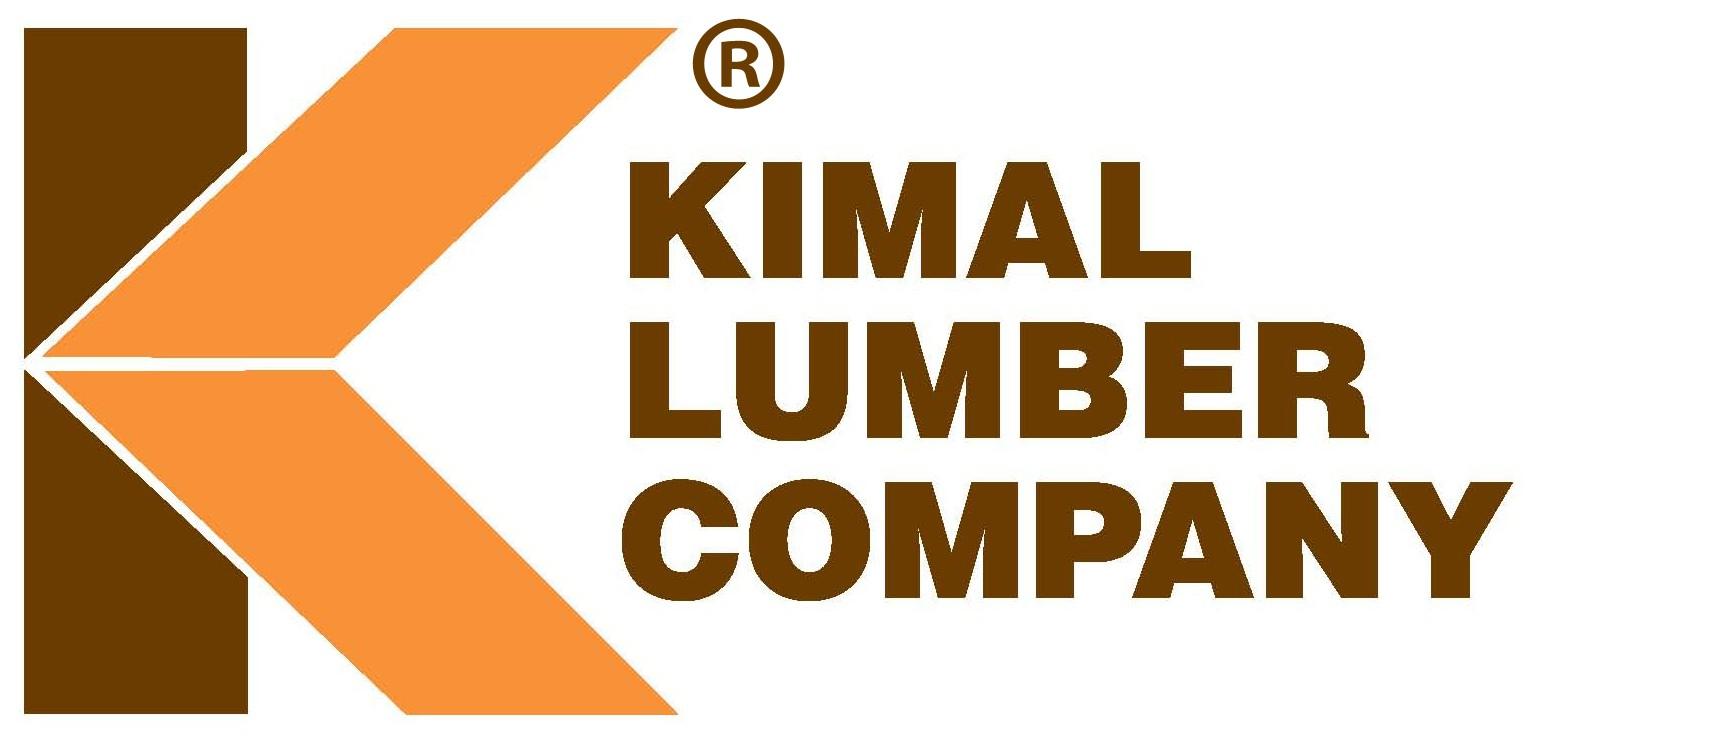 Kimal Lumber Company